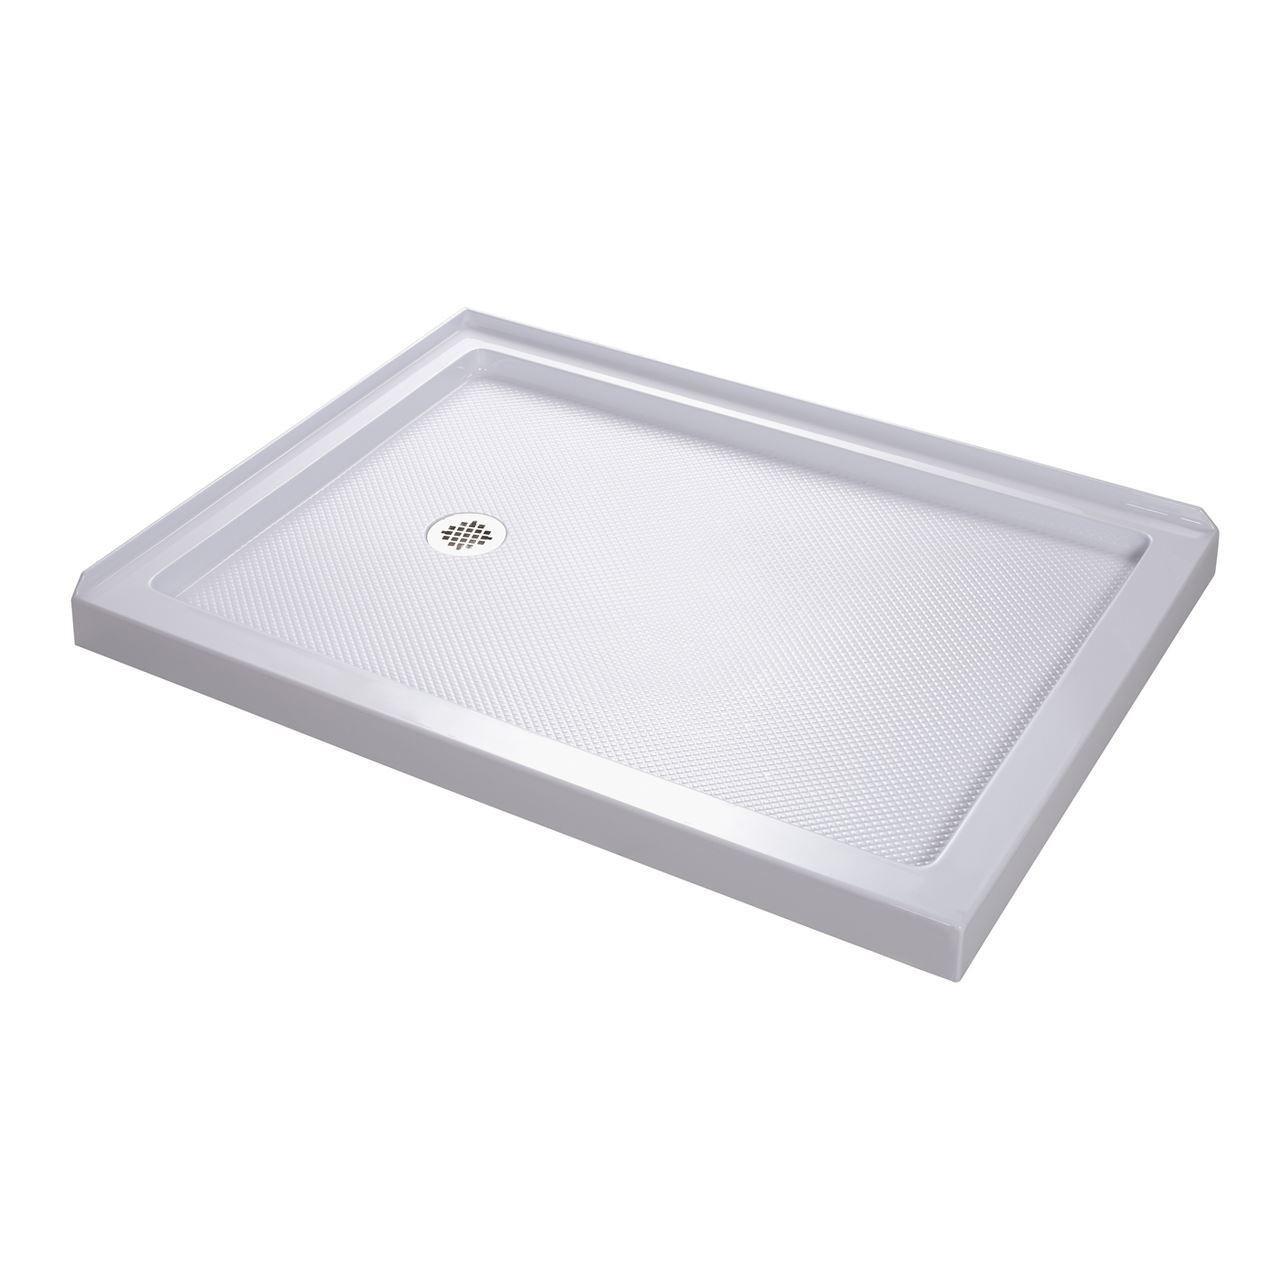 24 X 36 Shower Pan.36 X 60 Shower Base Affordable Tub To Shower Base